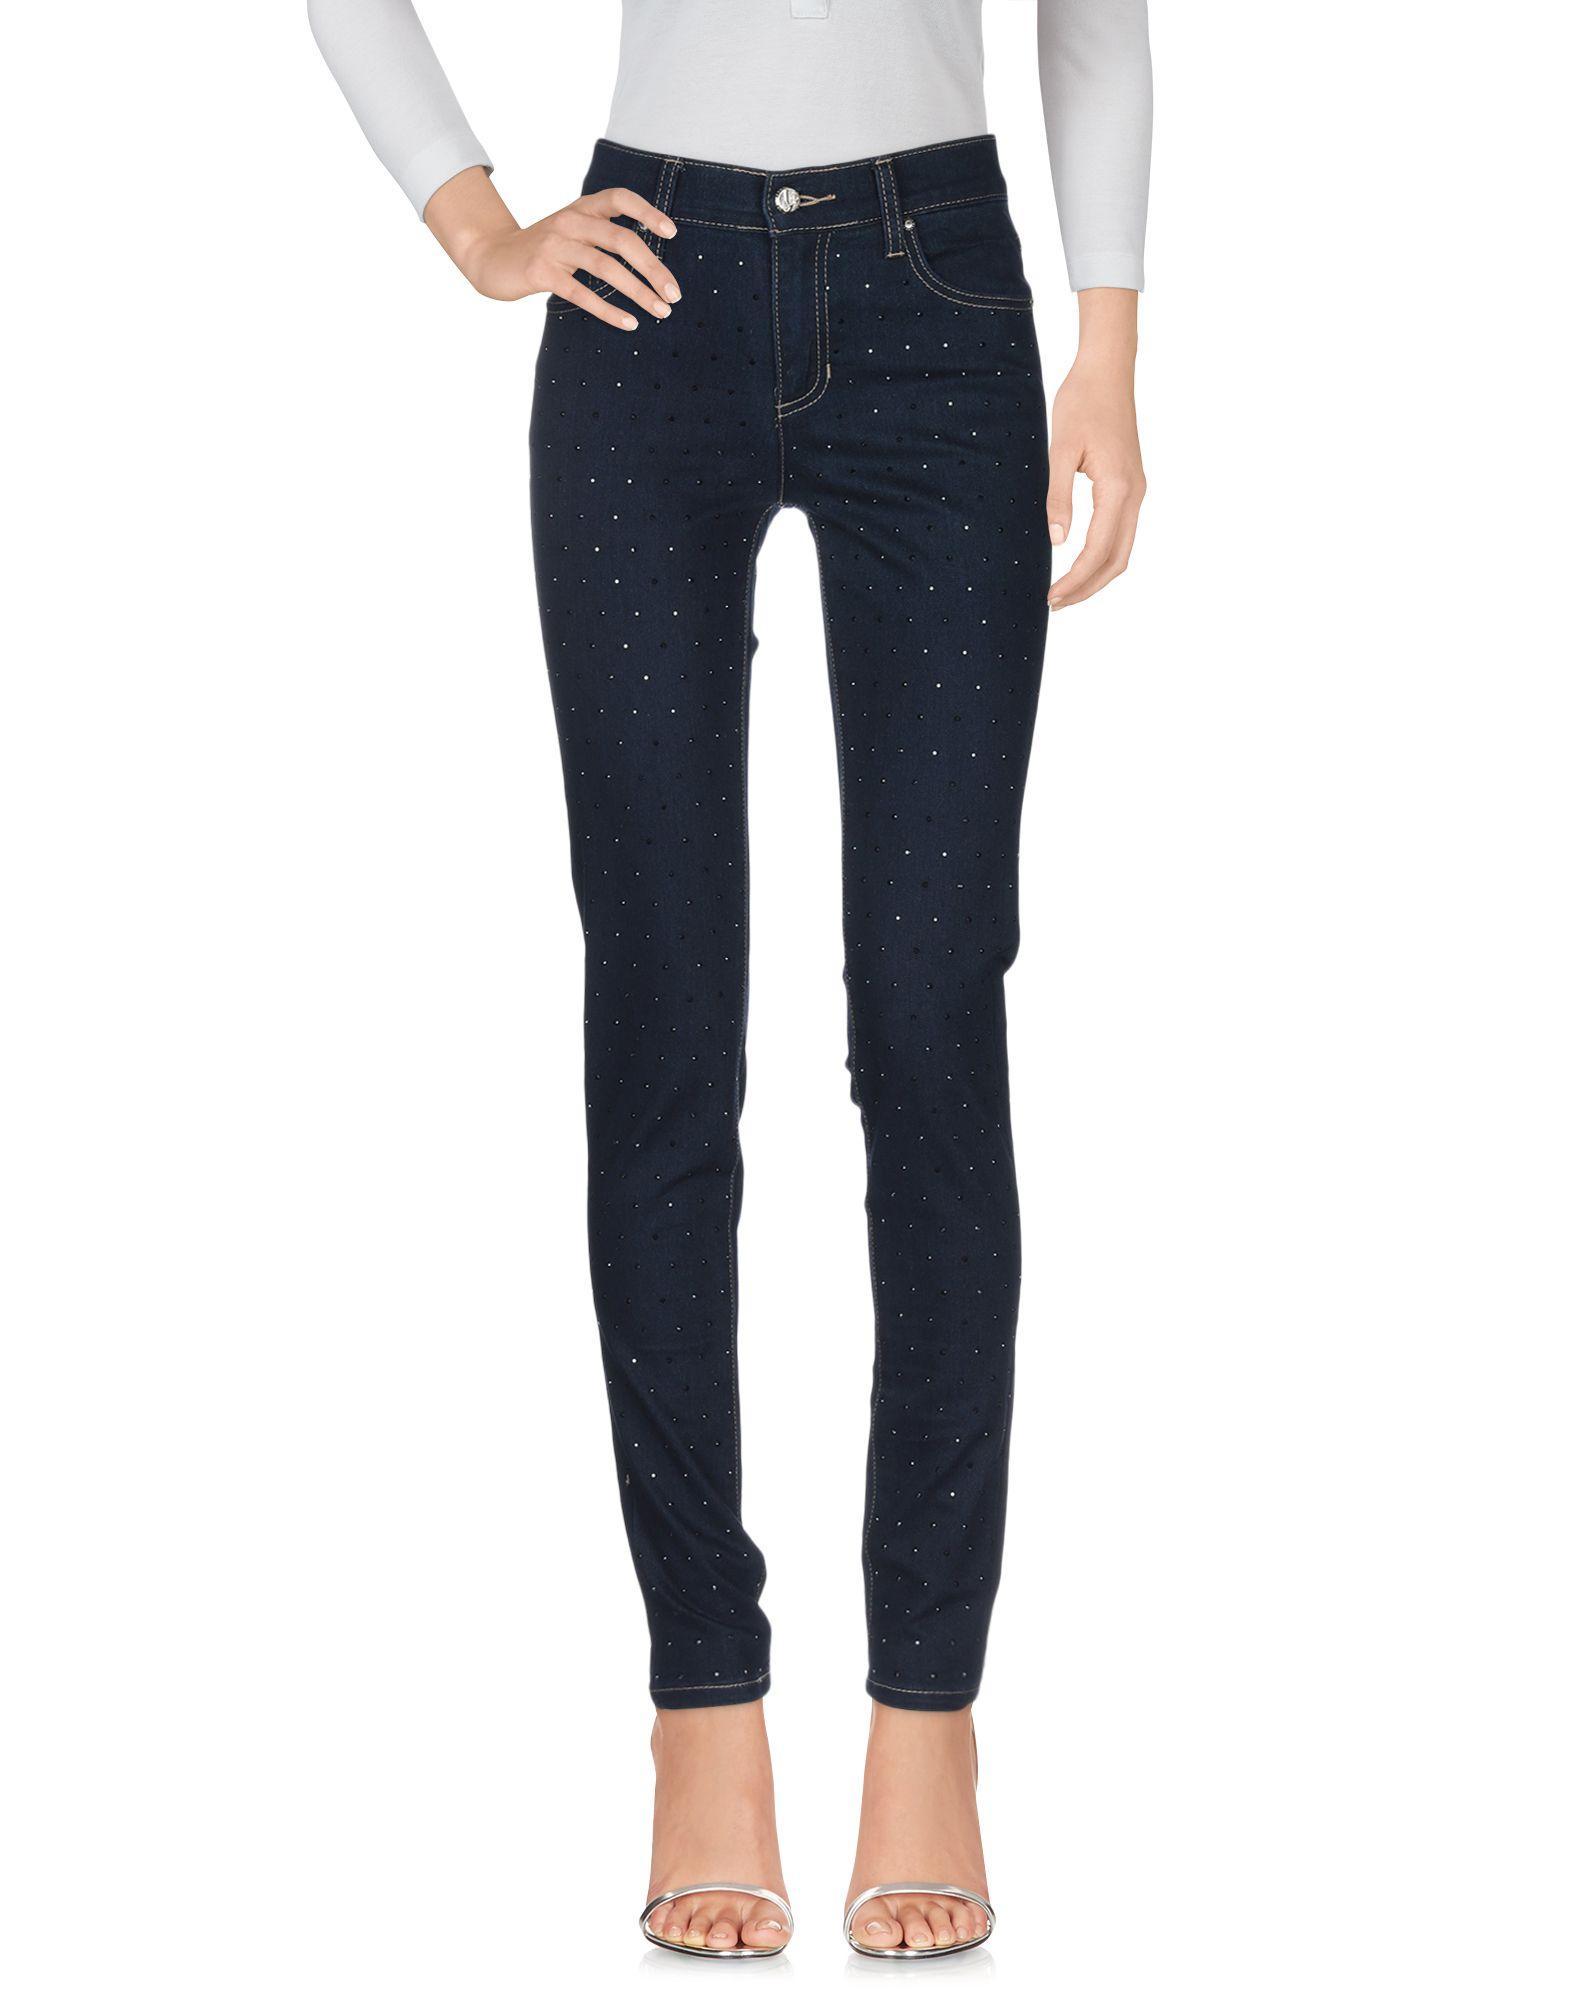 Pantalones vaqueros Versace Jeans Couture de Tejido sintético de color Azul